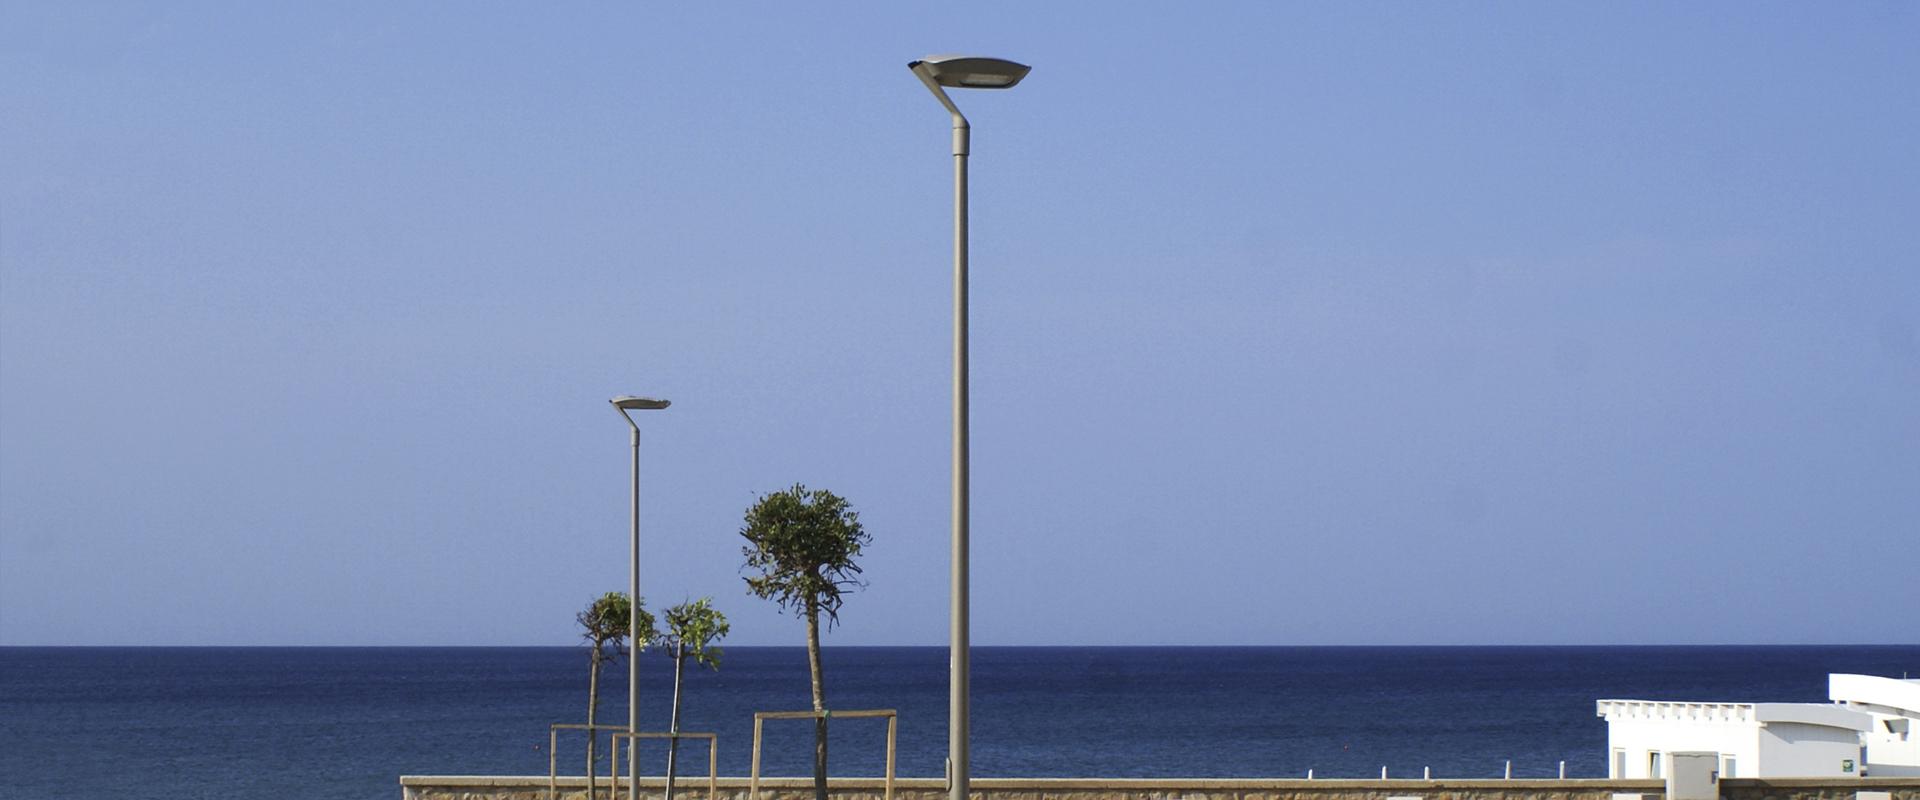 Italo 2 Urban TP - AEC Illuminazione